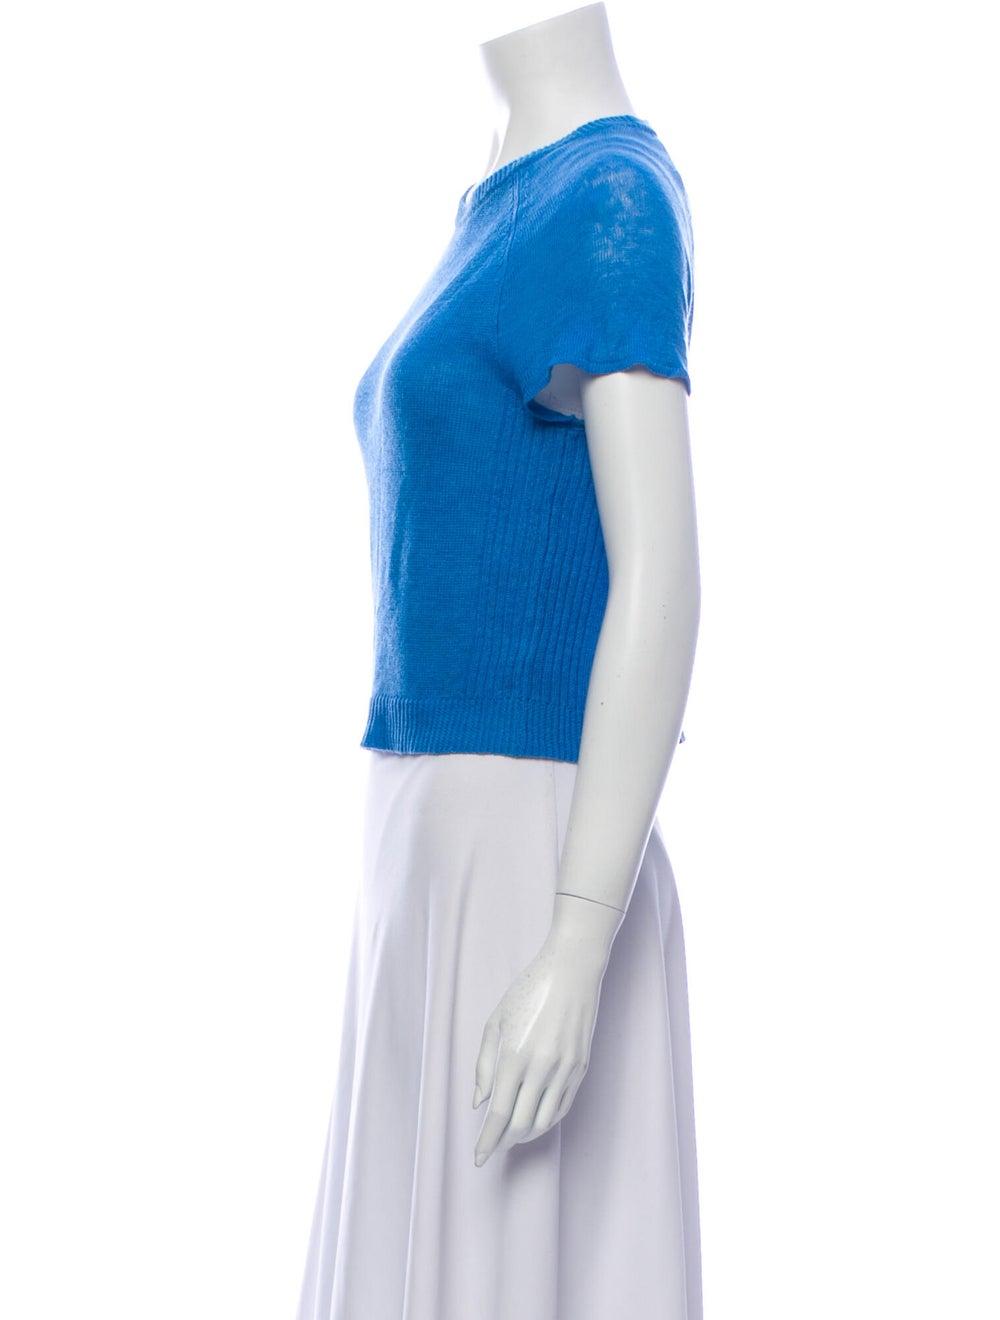 Alice + Olivia Linen Crew Neck T-Shirt Blue - image 2